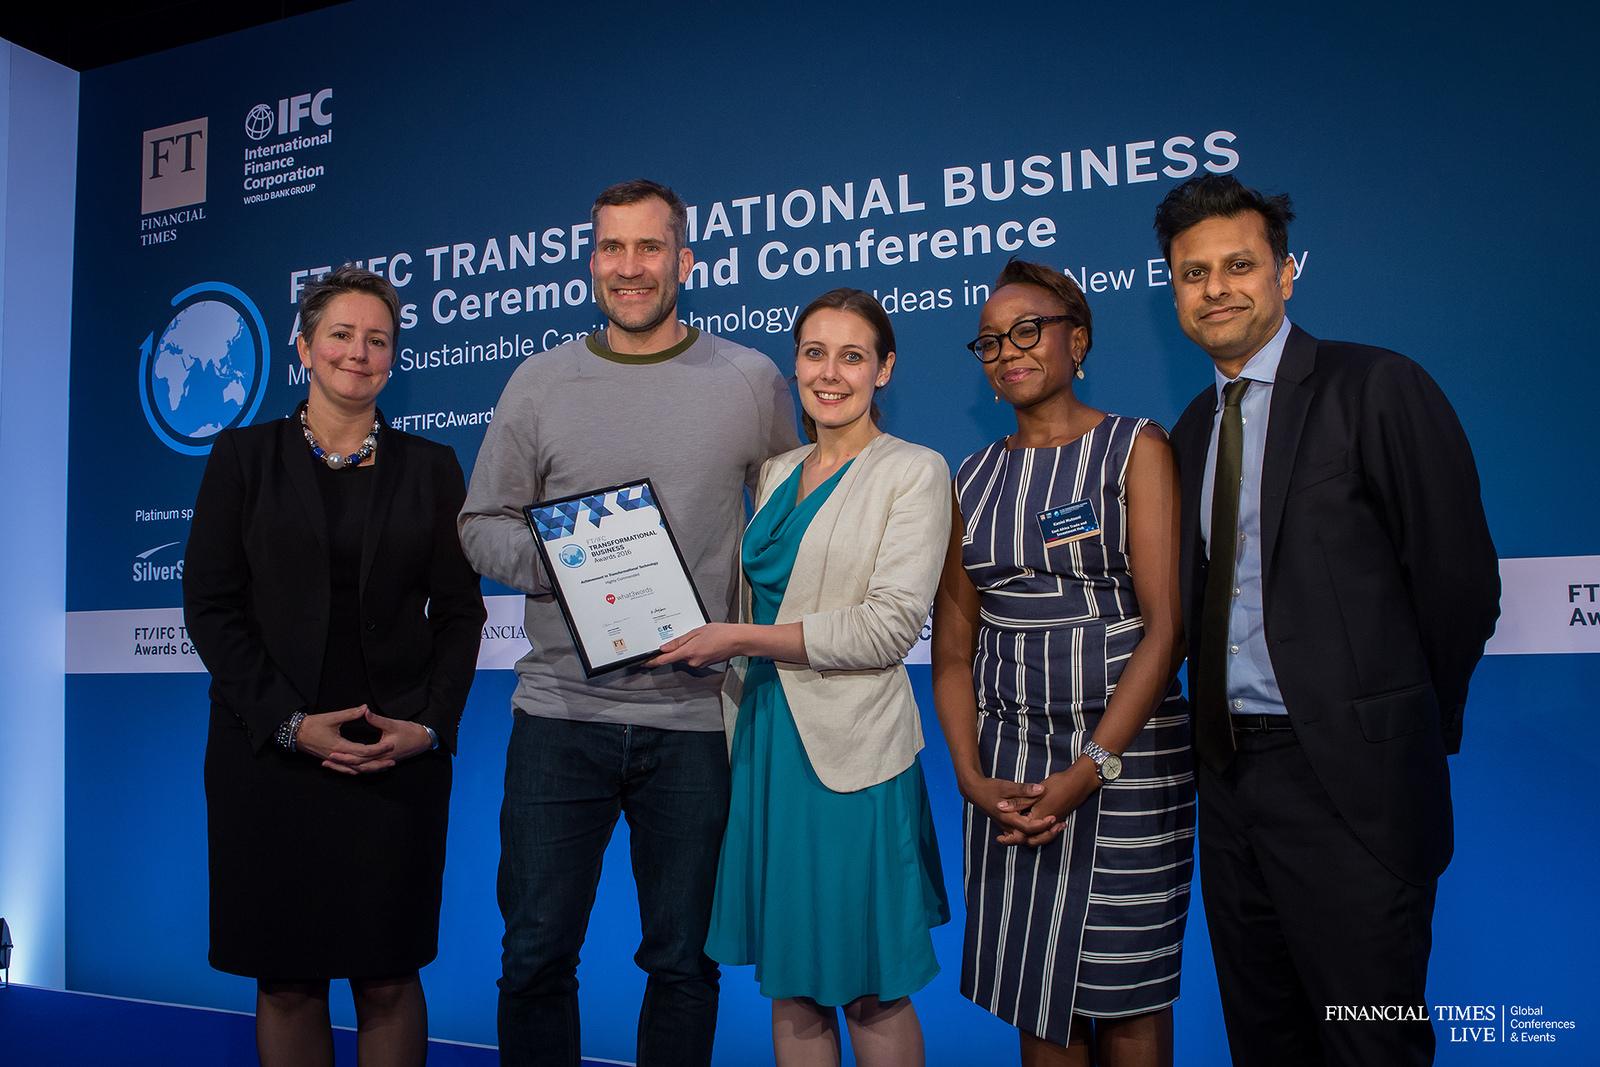 Giles Rhys Jones, CMO, receiving an award